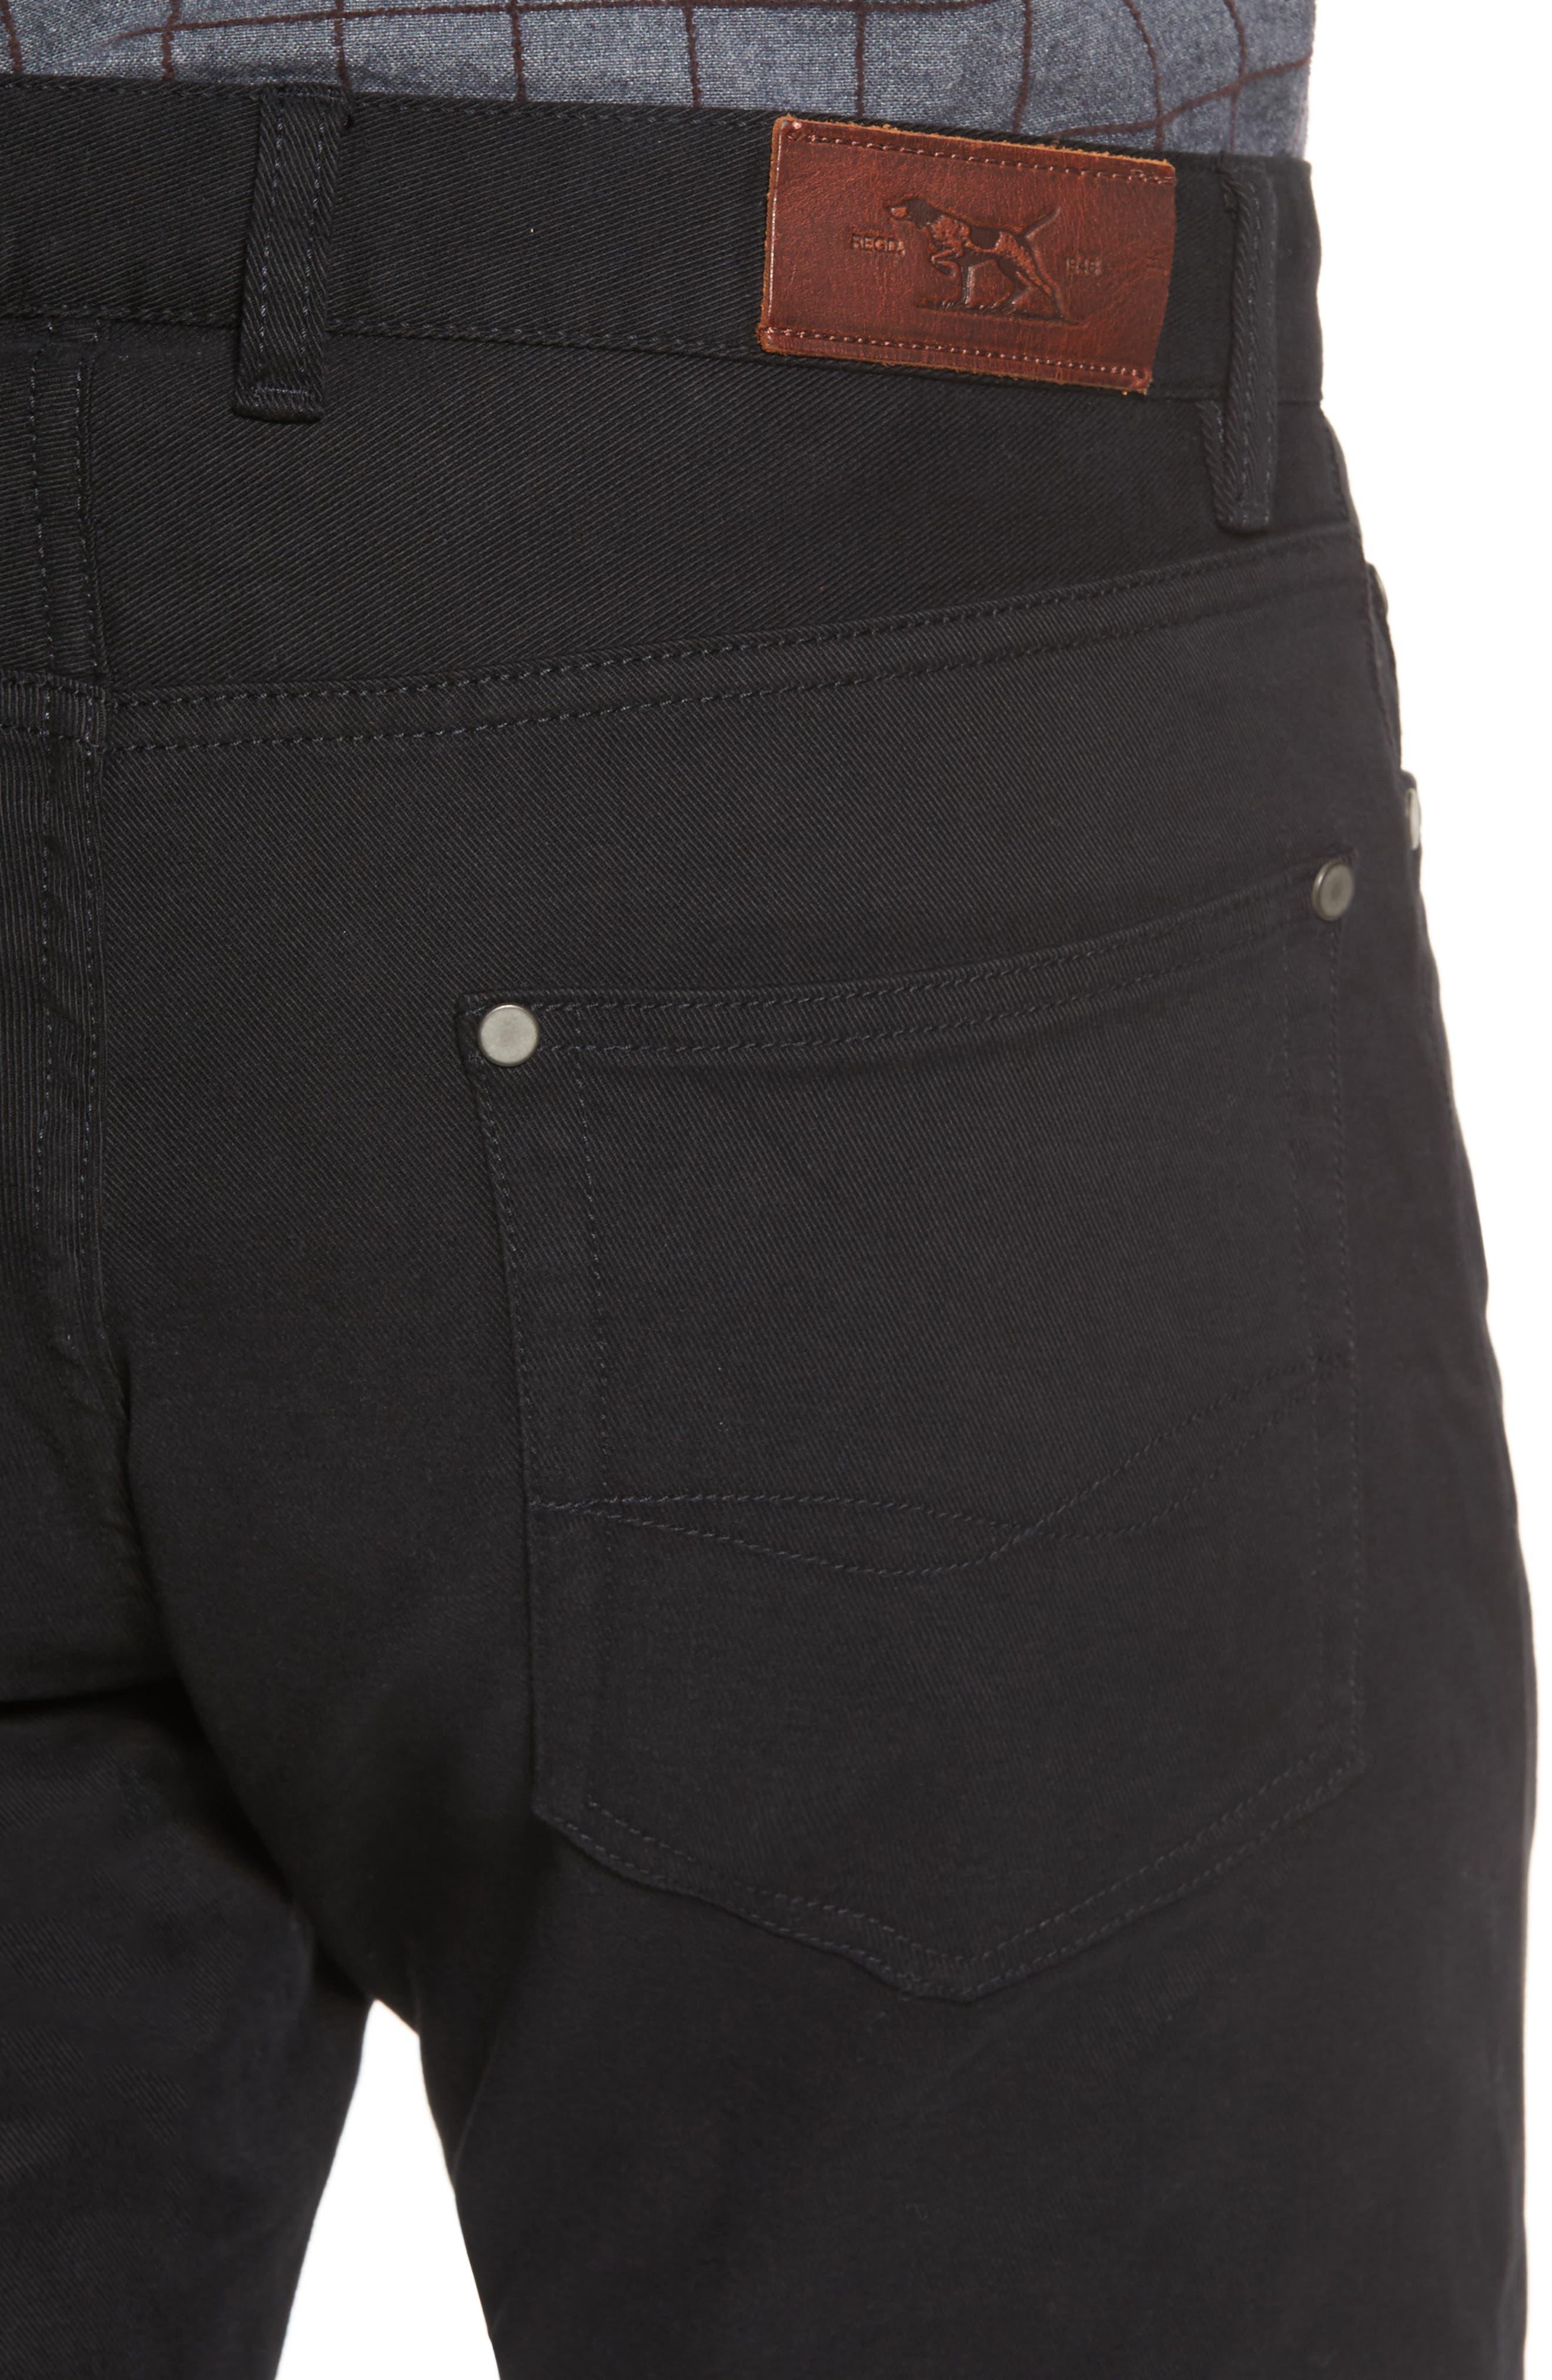 'Barters' Straight Leg Twill Pants,                             Alternate thumbnail 4, color,                             Onyx